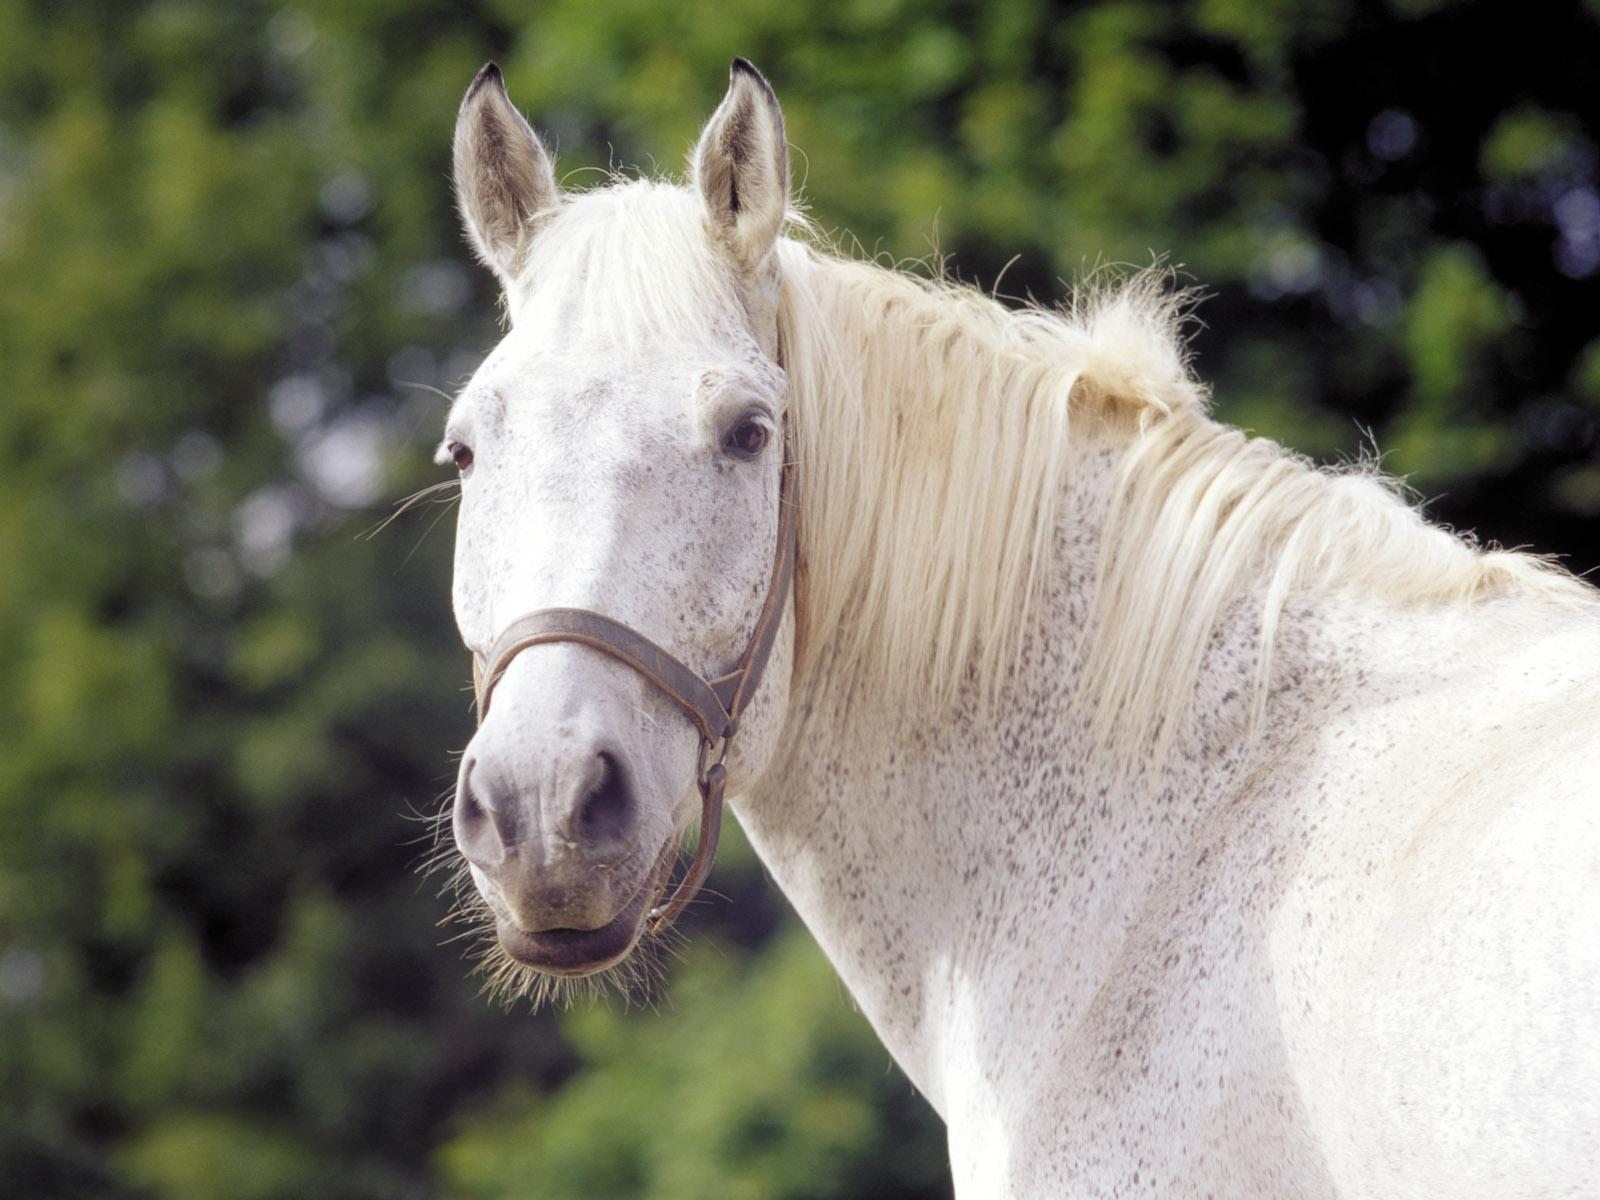 Close up of a white horse desktop wallpaper 1600x1200